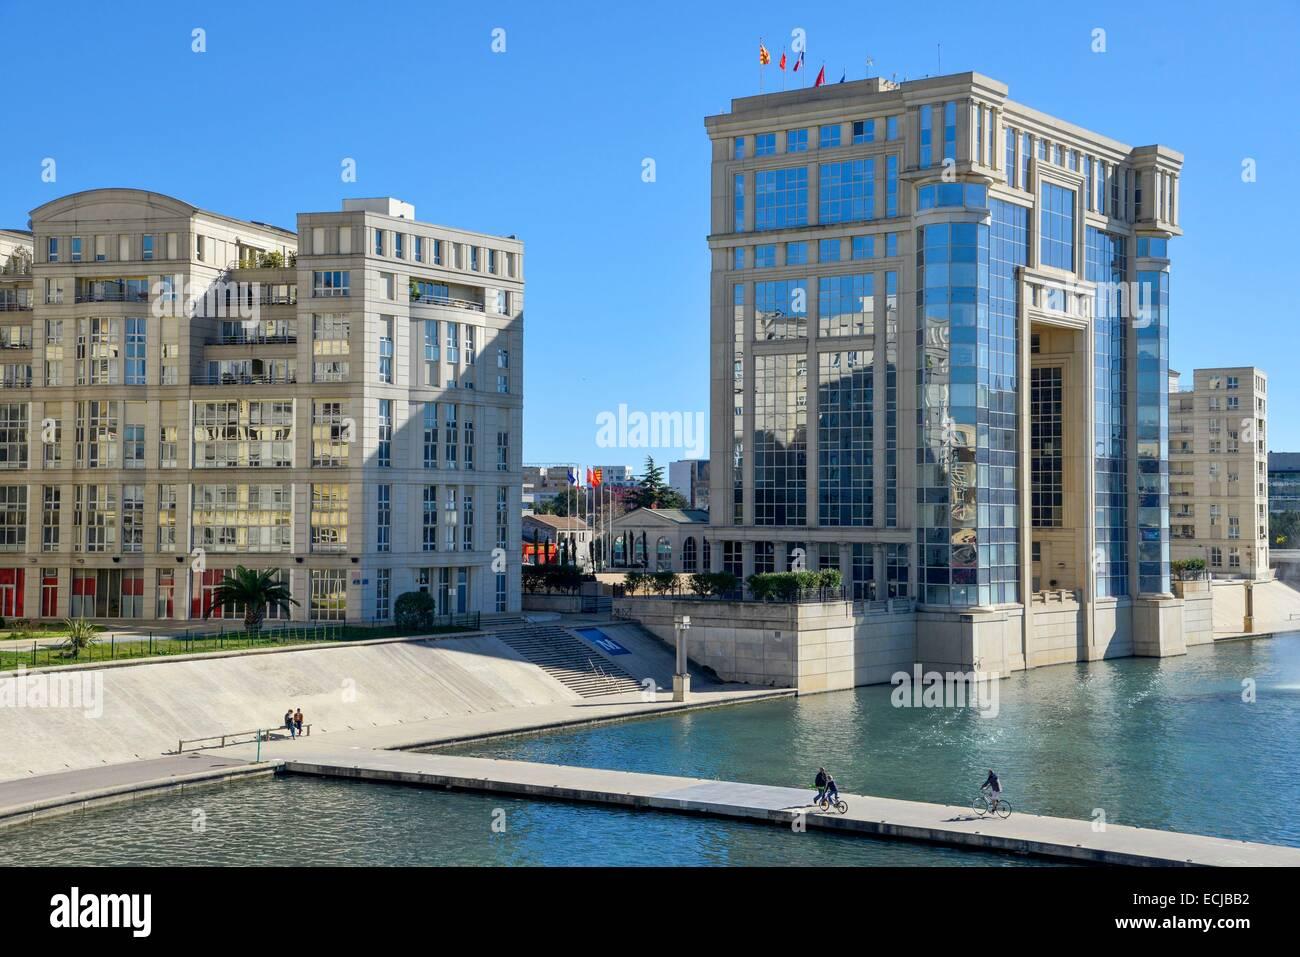 France herault montpellier port marianne district - Horaire poste montpellier port marianne ...